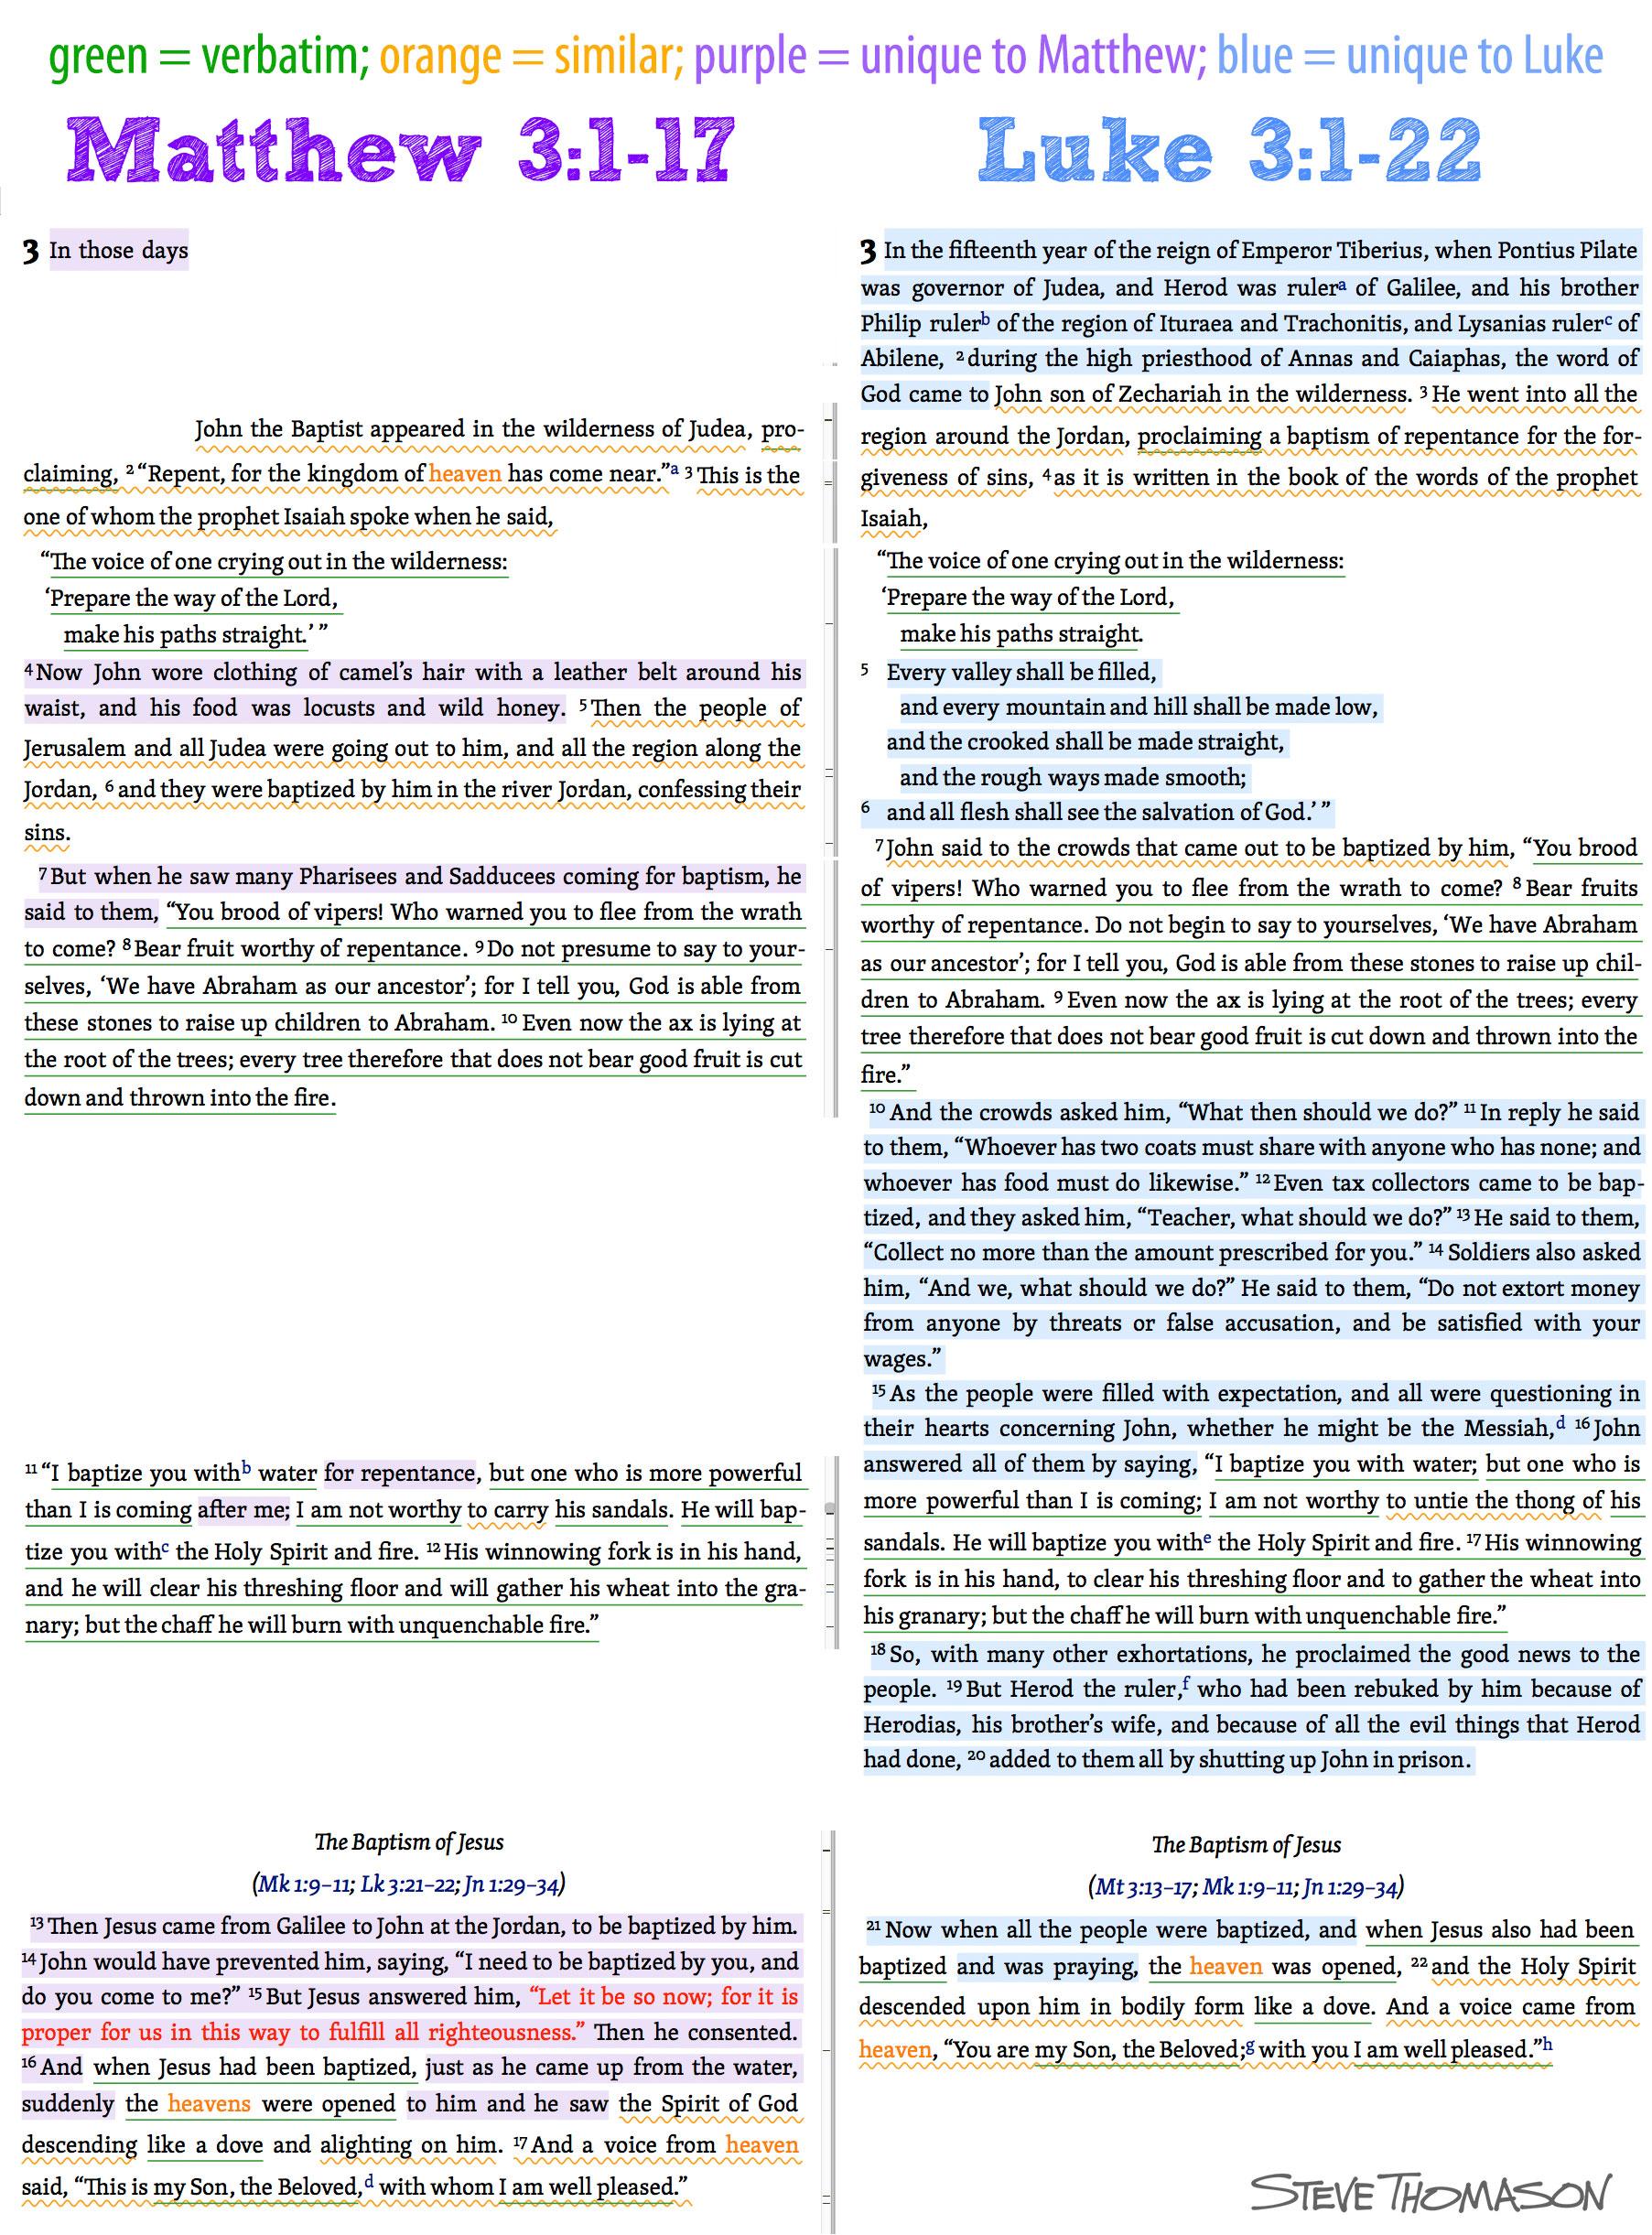 Matthew 3 compared to Luke 3 John the Baptist and Jesus baptism